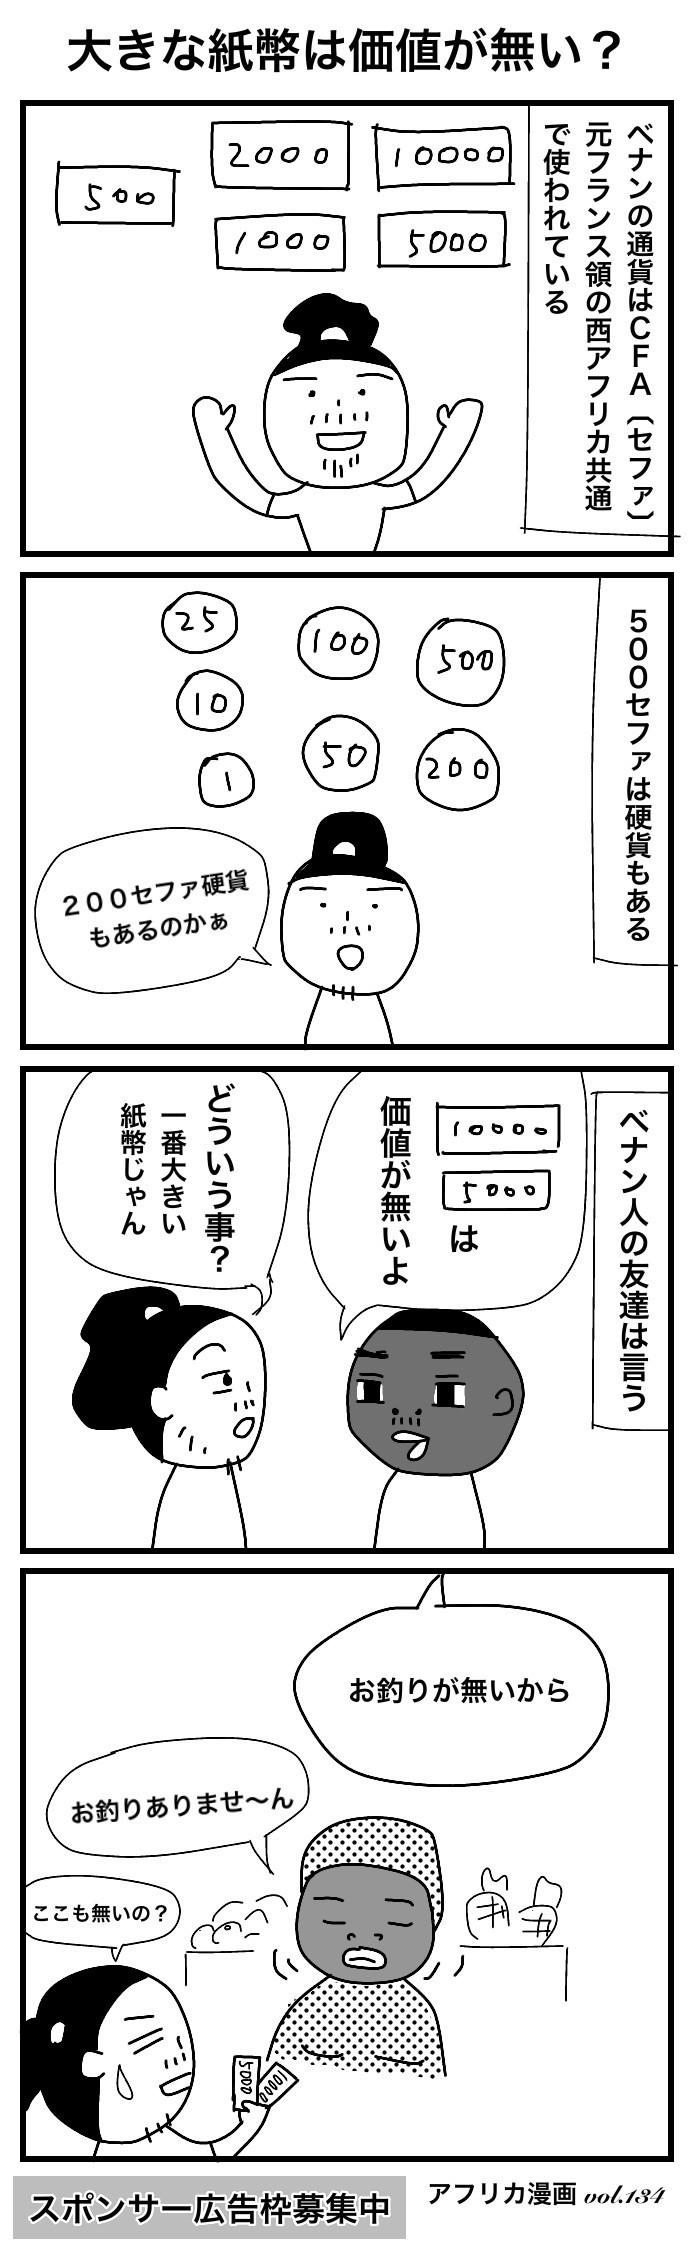 JPEGイメージ-56CA41AD0116-1